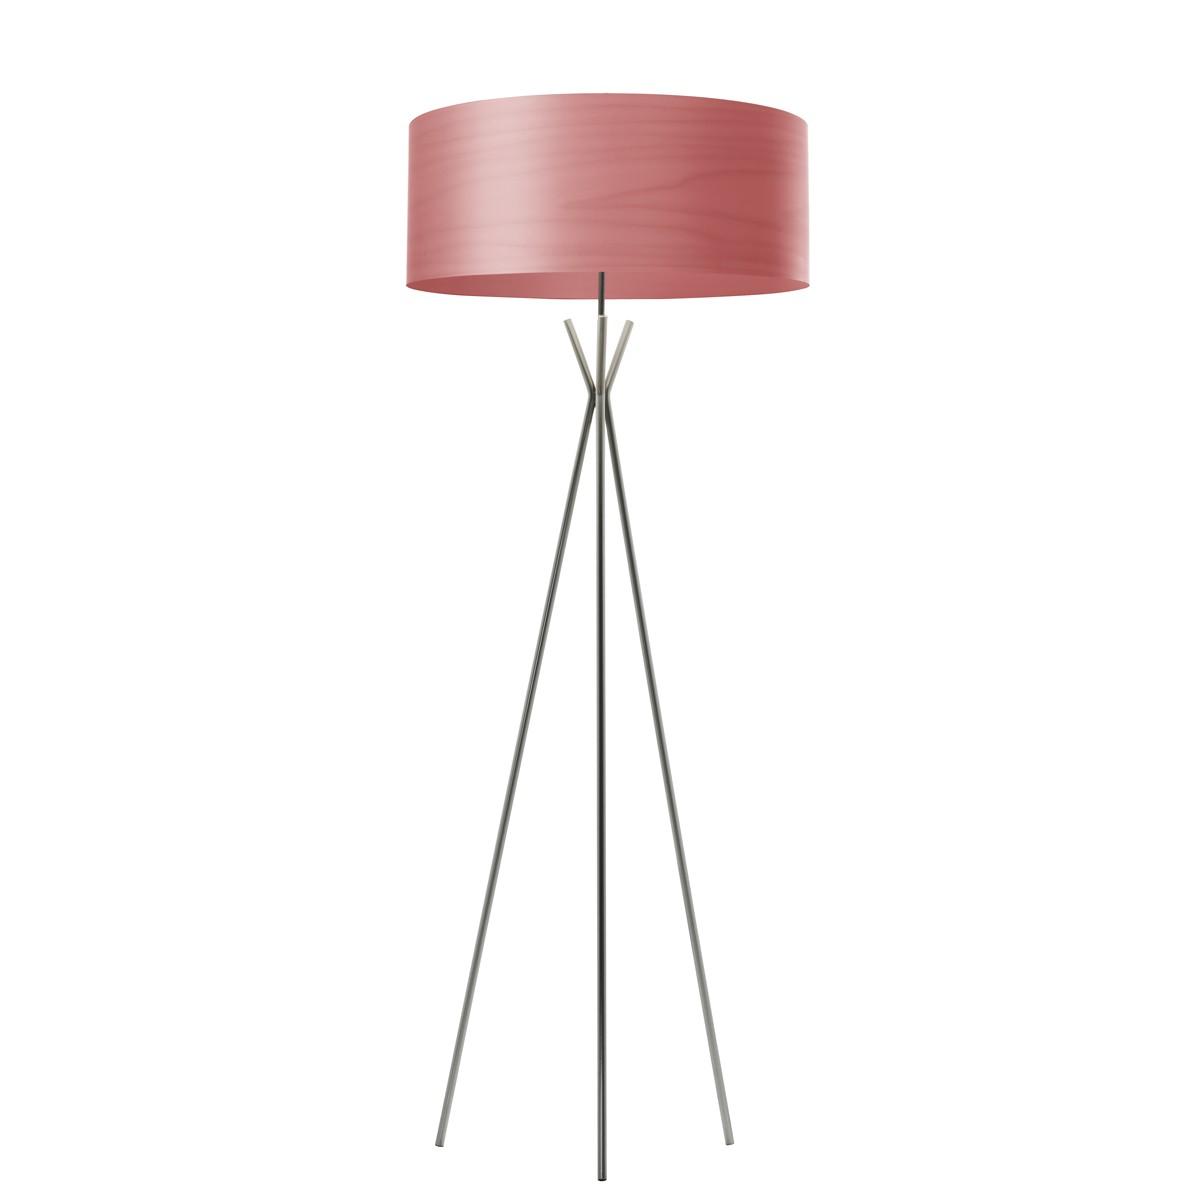 LZF Lamps Cosmos Stehleuchte, Schirm: pink